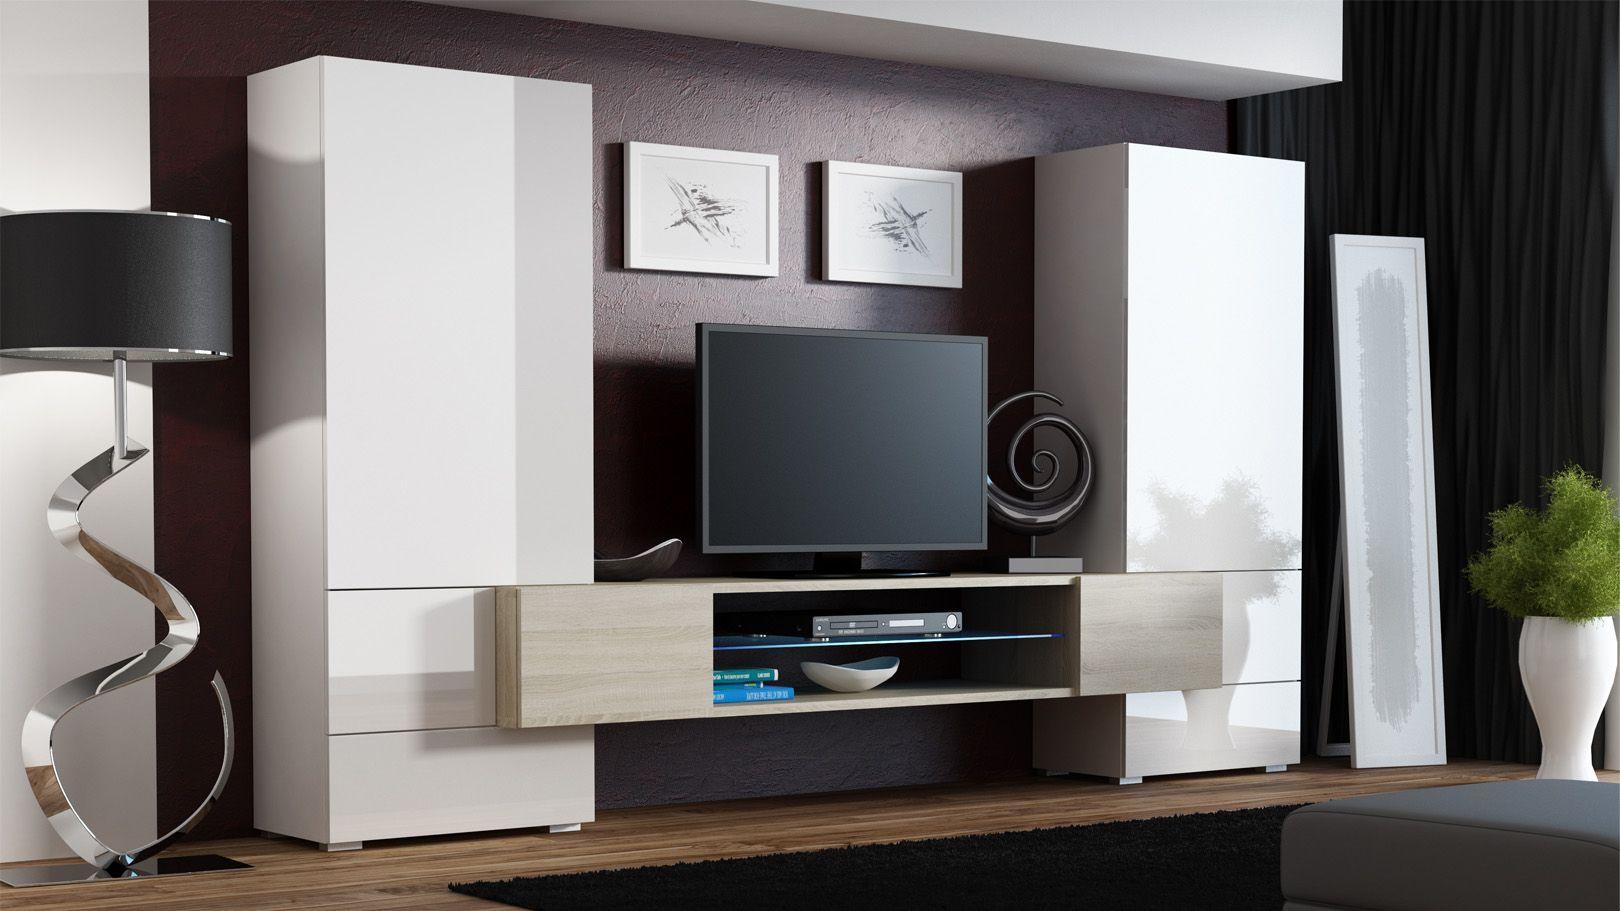 Moderne Wandmeubels Modern Tv Wandmeubels Design Meubels Woonkamer Goedkope Tv Meubels Tv Meubels Goedko Meuble Tv Mural Design Meuble Meuble Tv Design